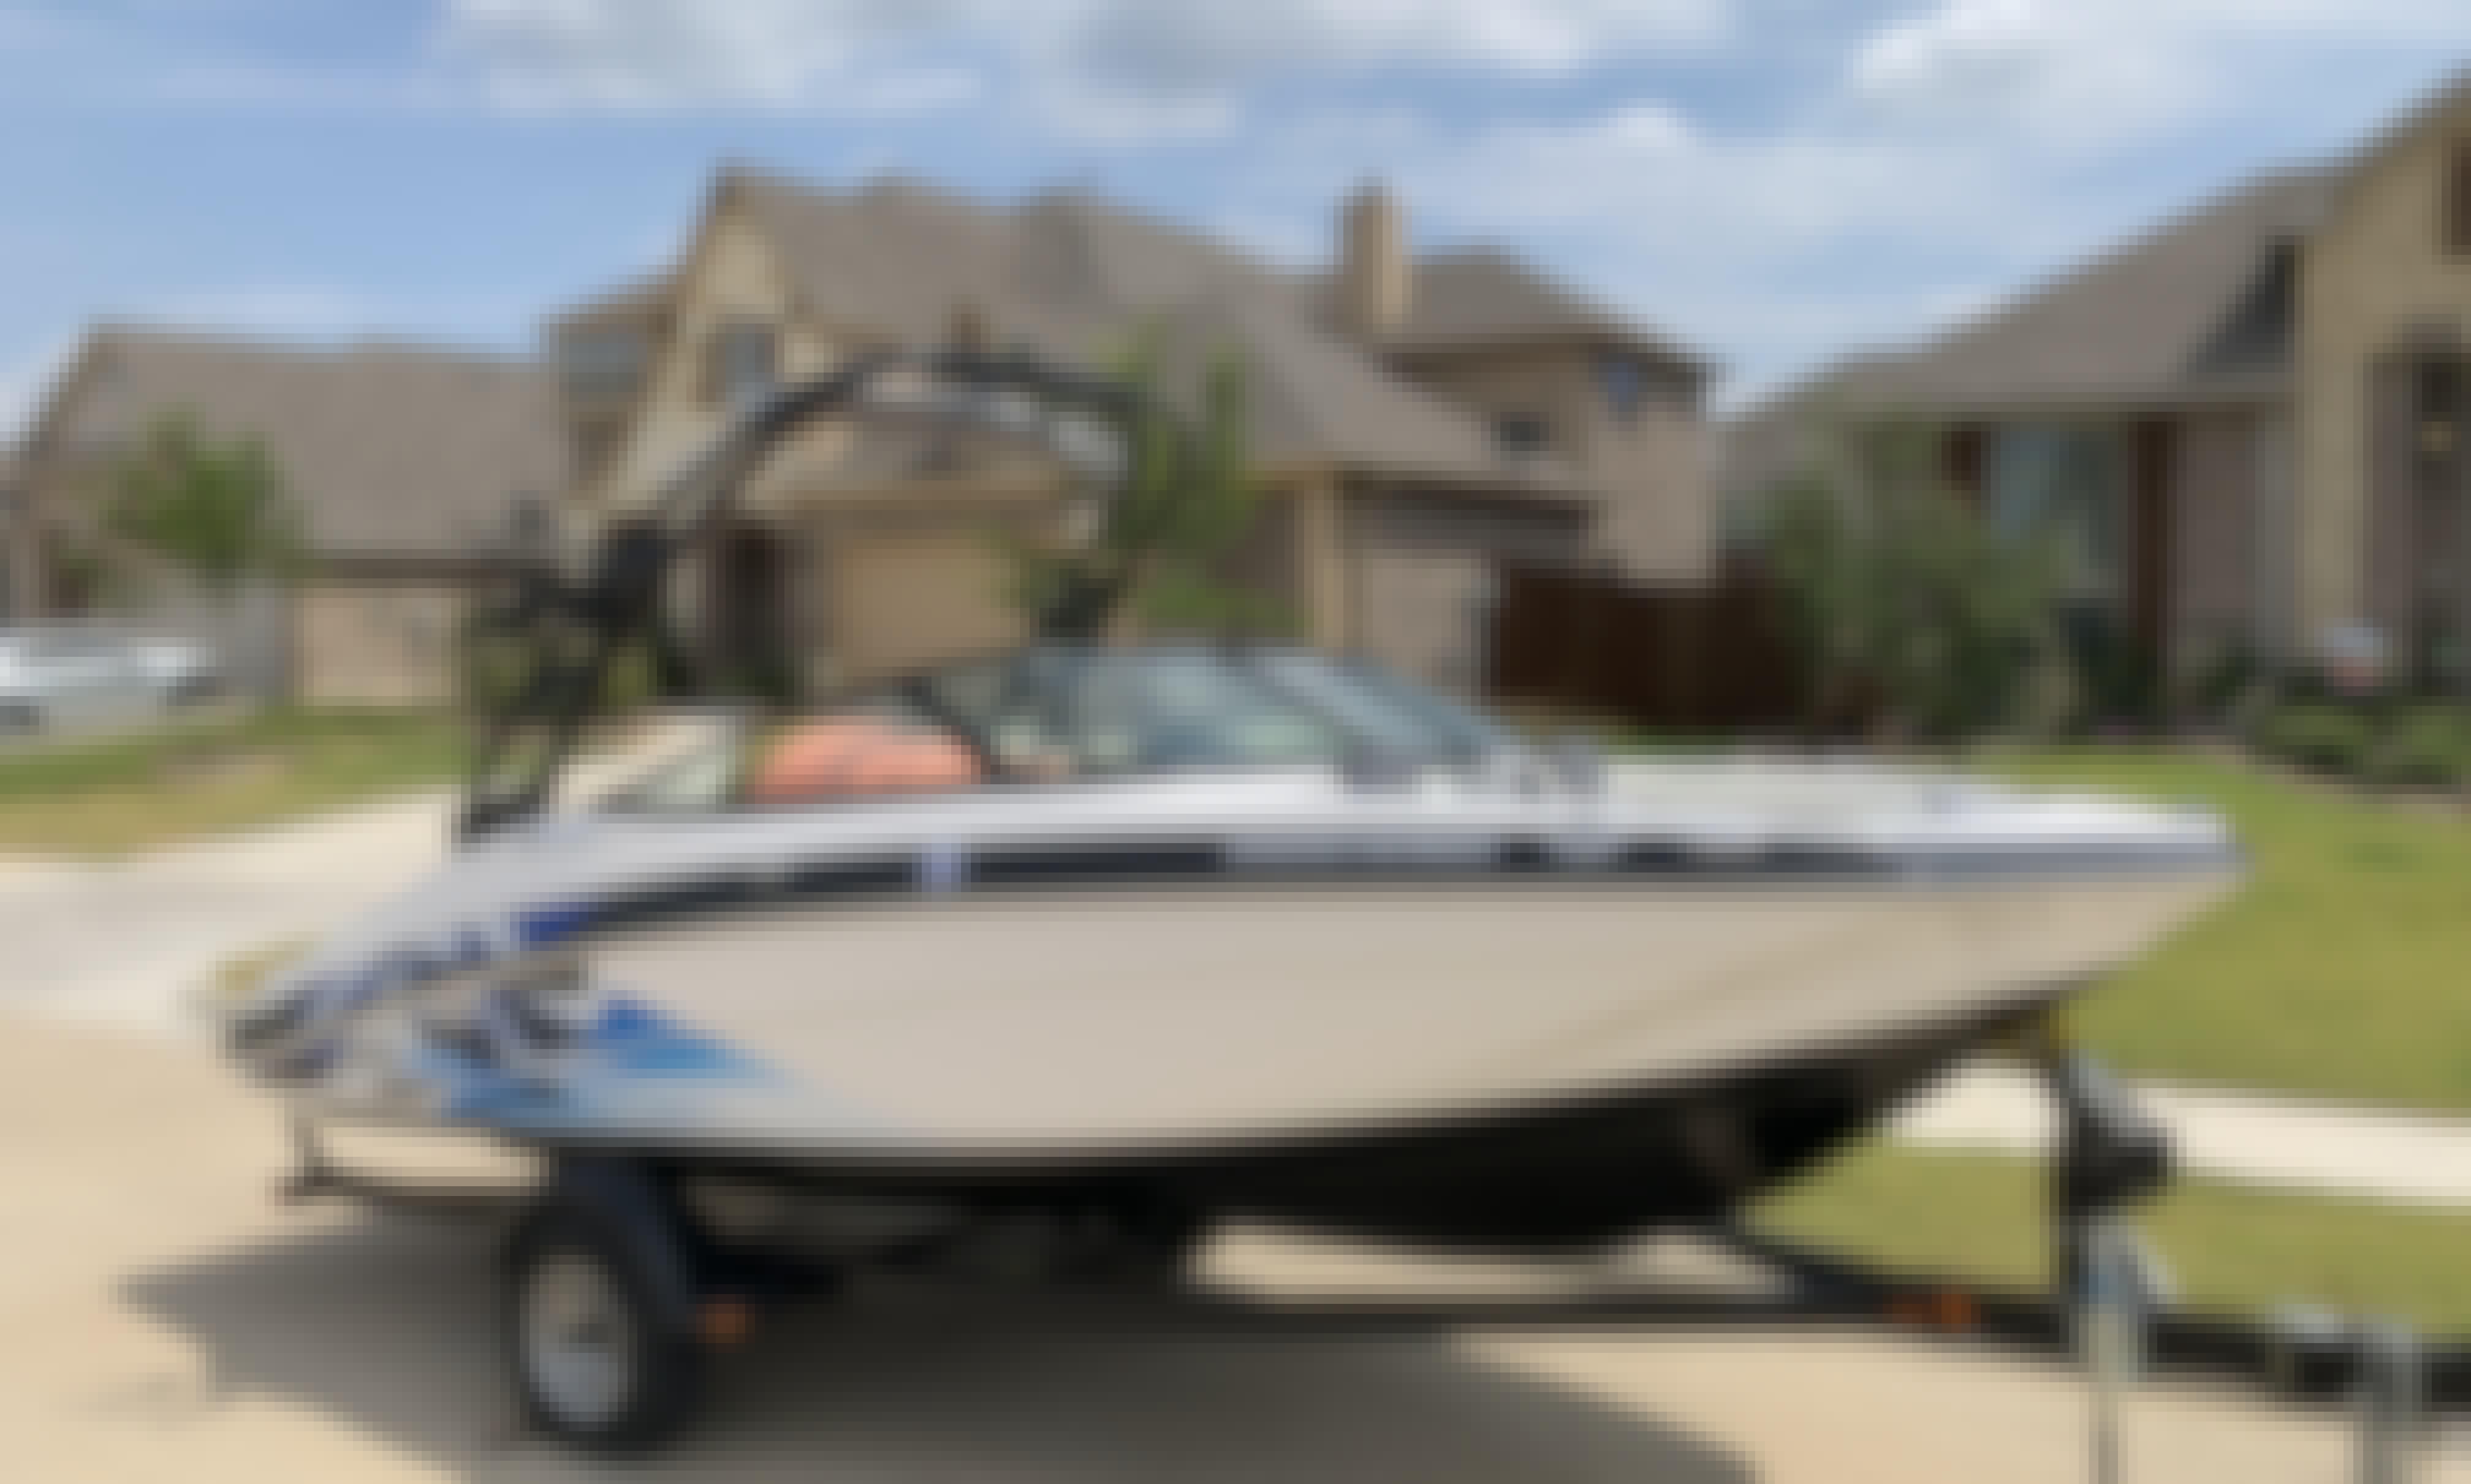 2017 19' Yamaha Jet Boat On Joe Pool Lake With Cap'n Mike